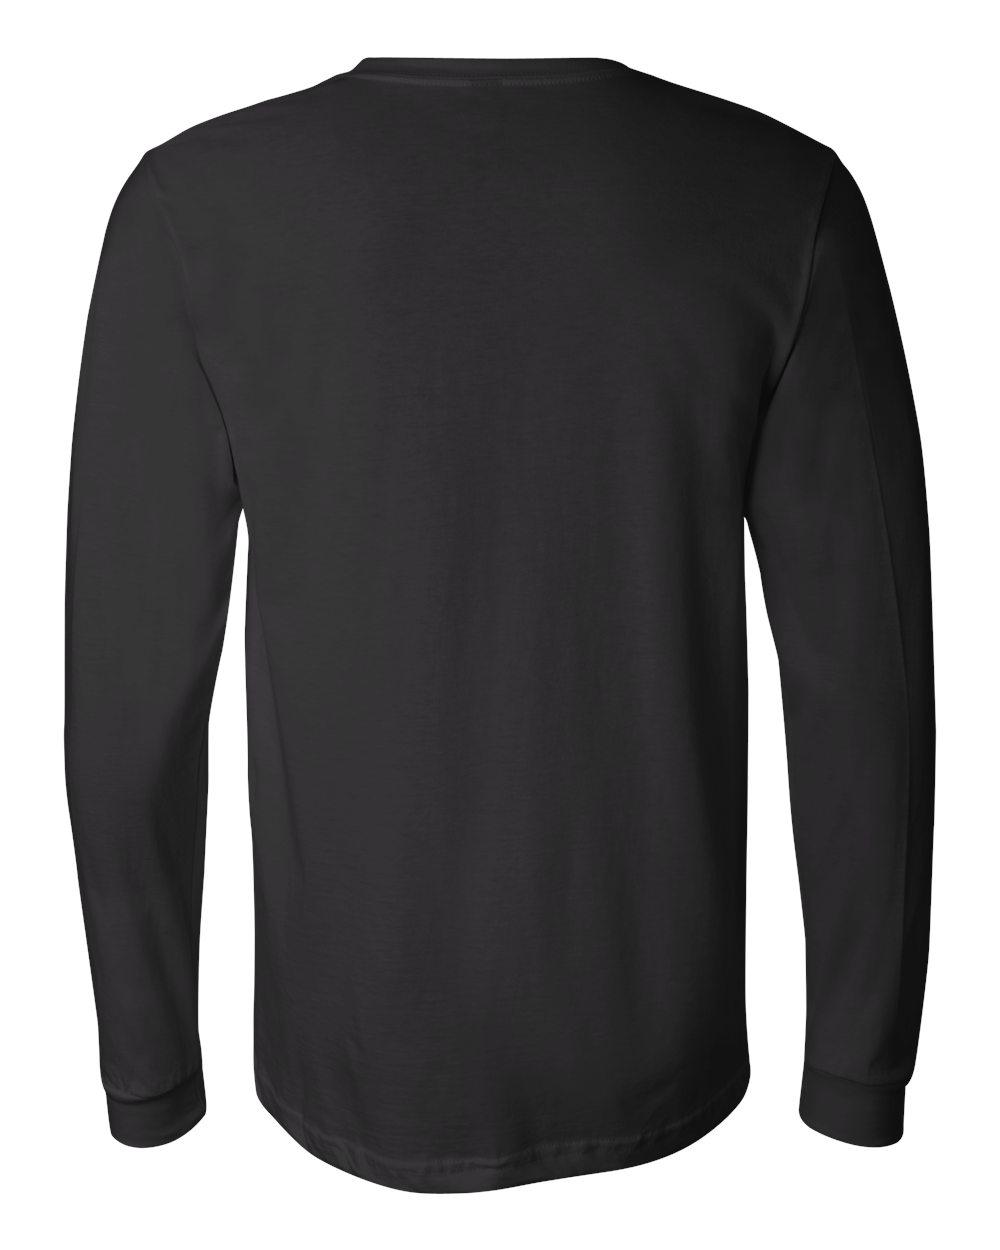 Bella-Canvas-Mens-Blank-Top-Long-Sleeve-Jersey-Tee-T-Shirt-3501-up-to-3XL thumbnail 19